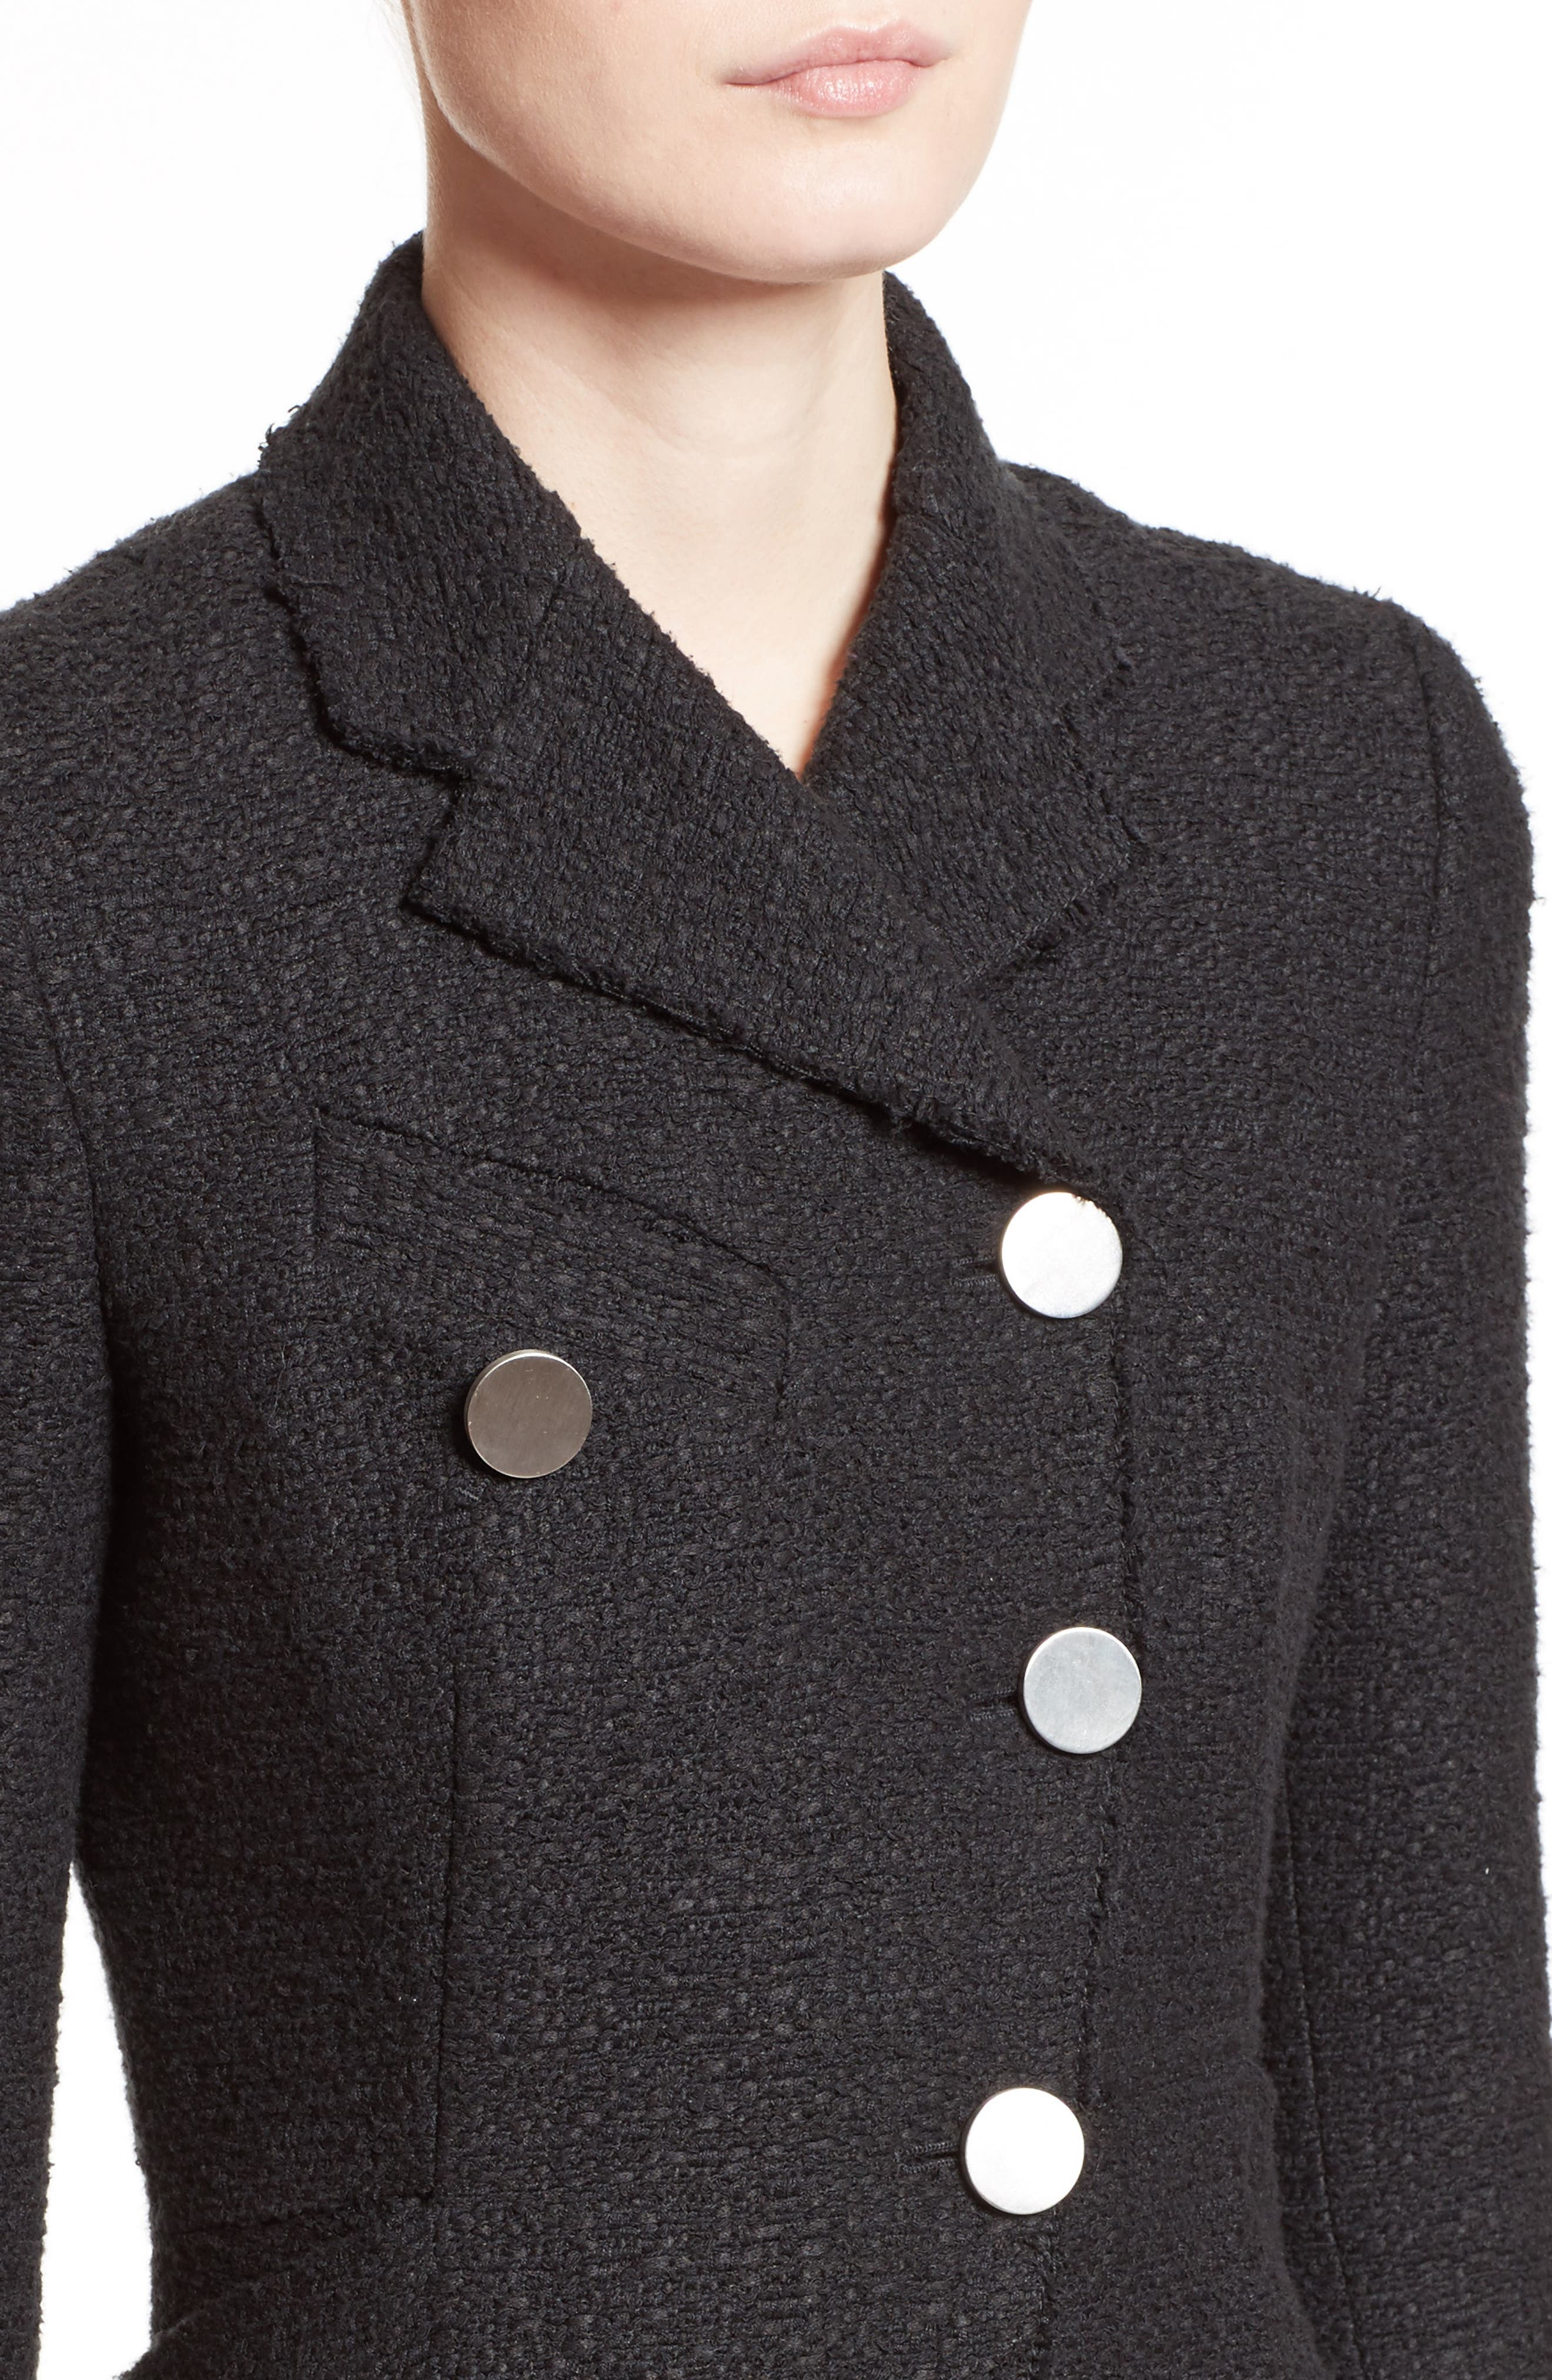 Asymmetrical Tweed Jacket,                             Alternate thumbnail 4, color,                             001